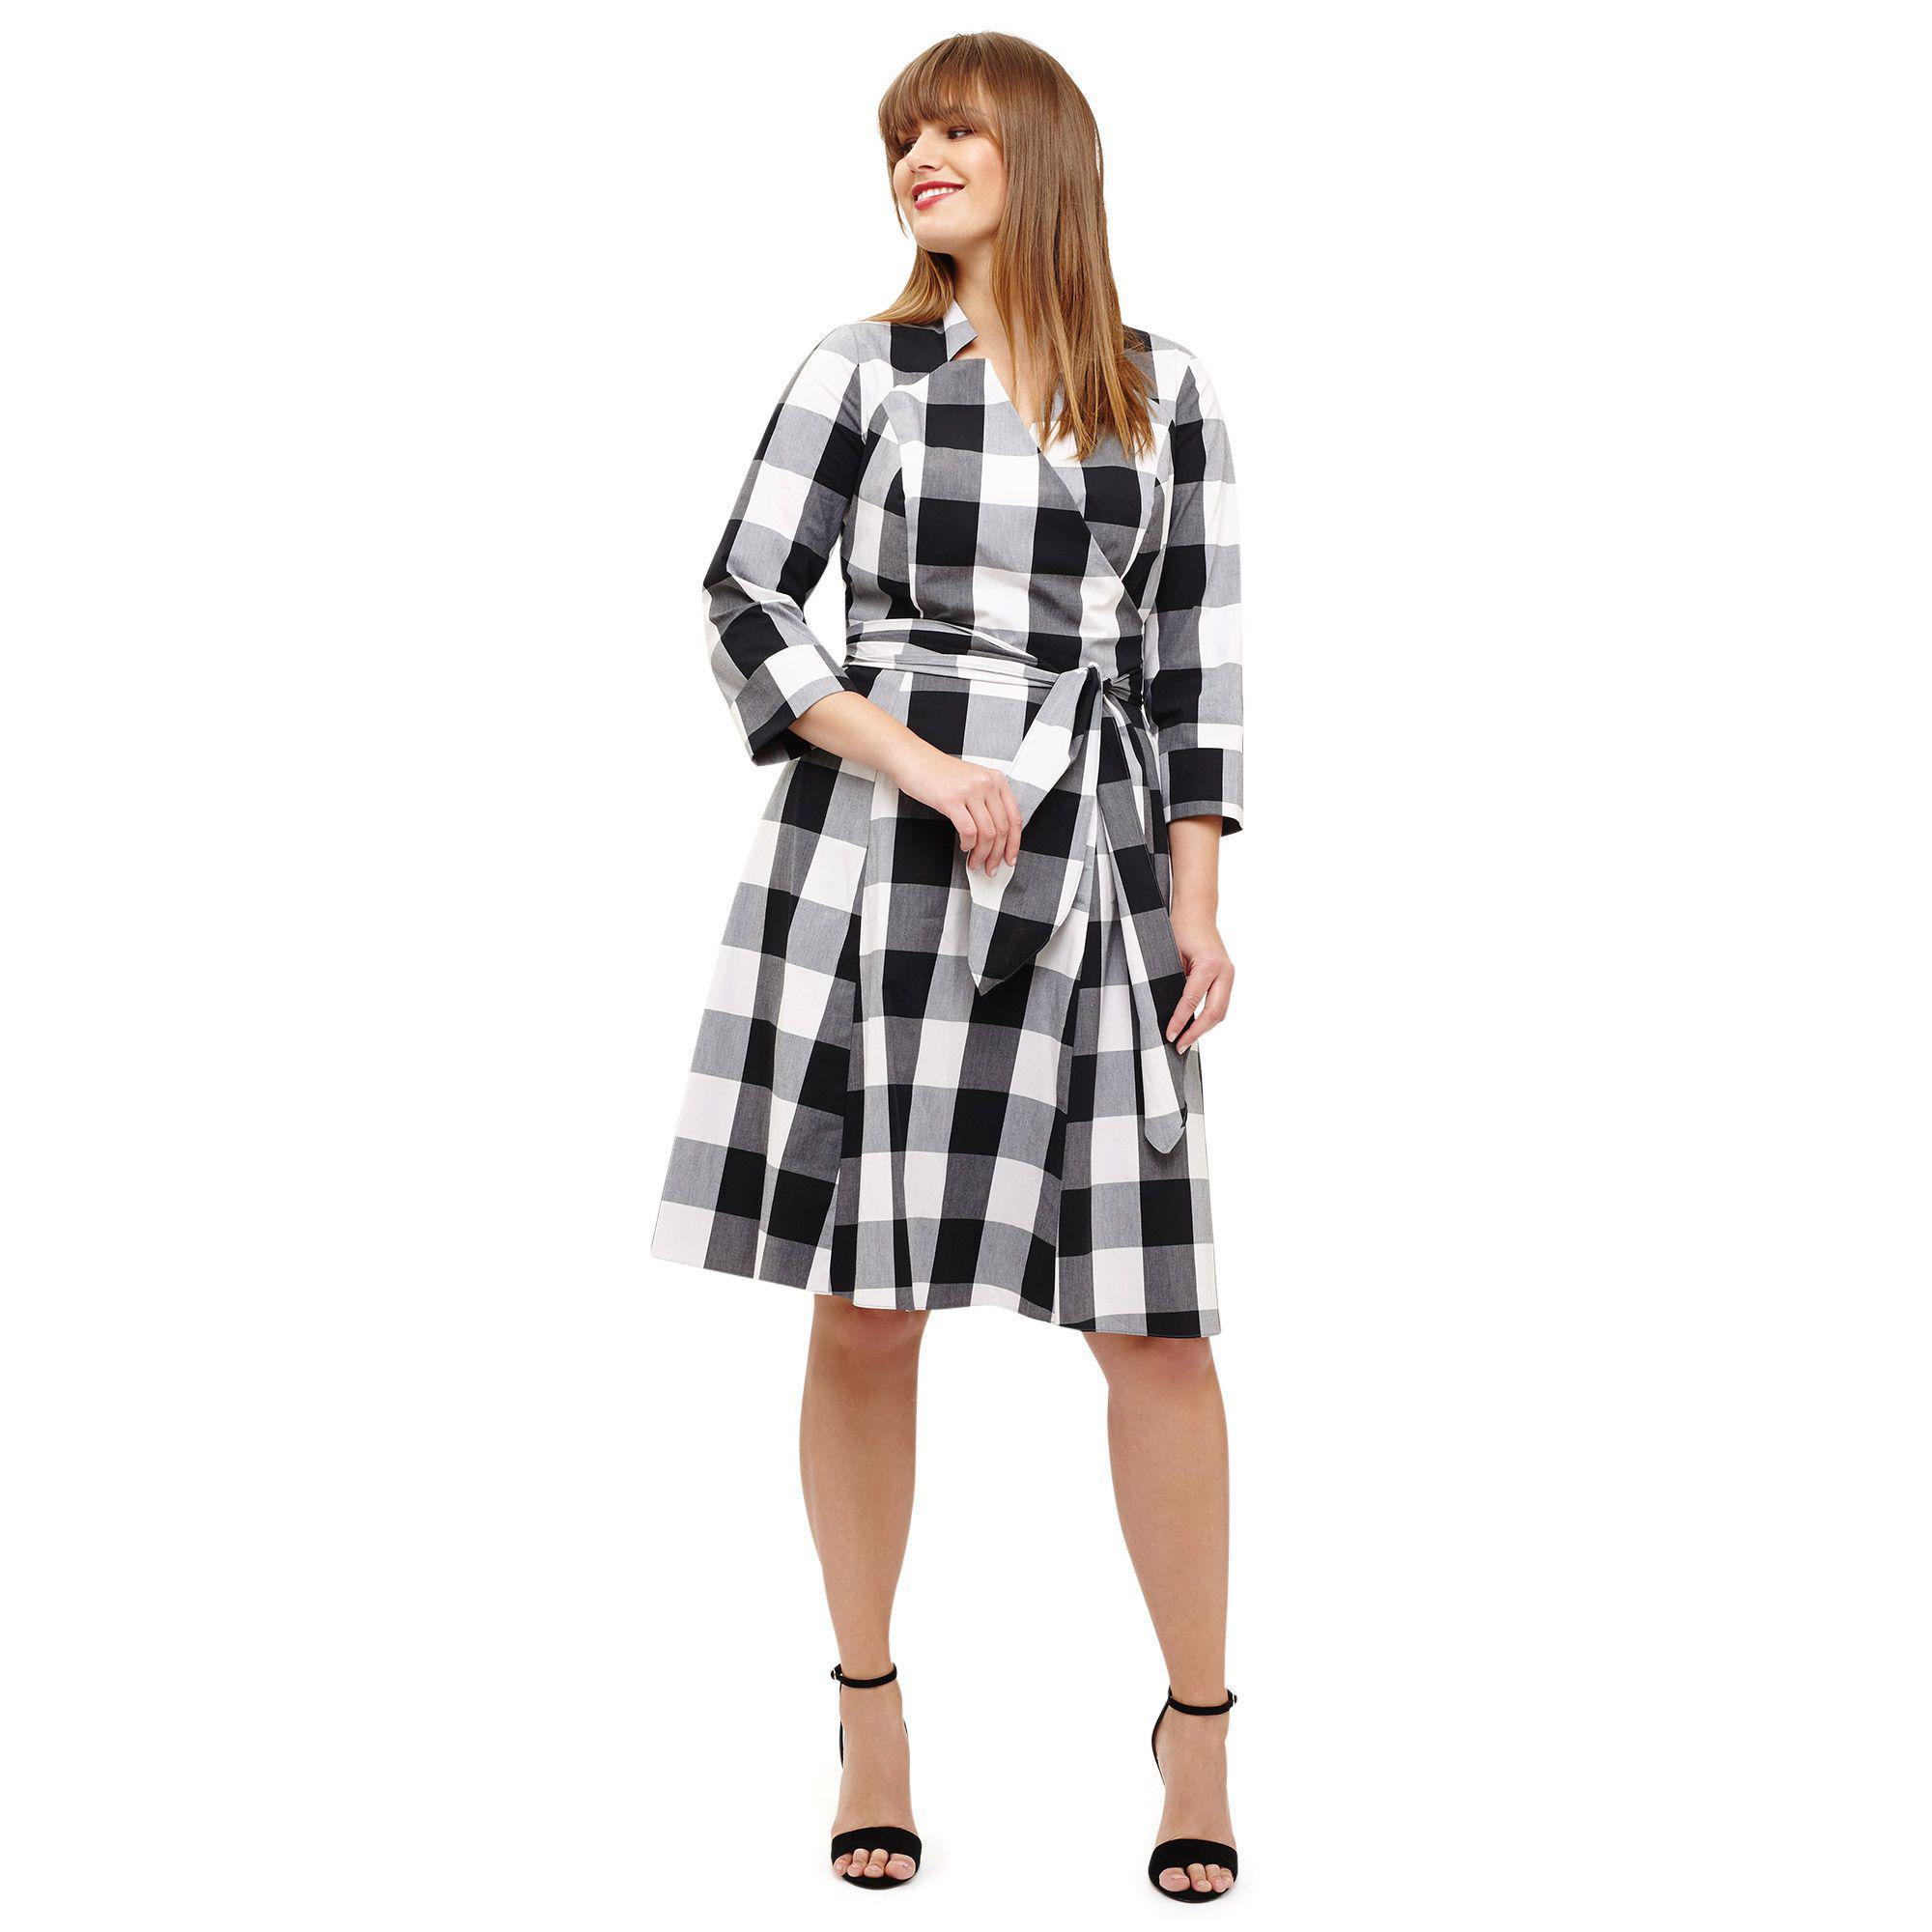 40c1d5ec3ed91 Studio 8 Sizes 12-26 Black Alice Gingham Dress in Black - Lyst